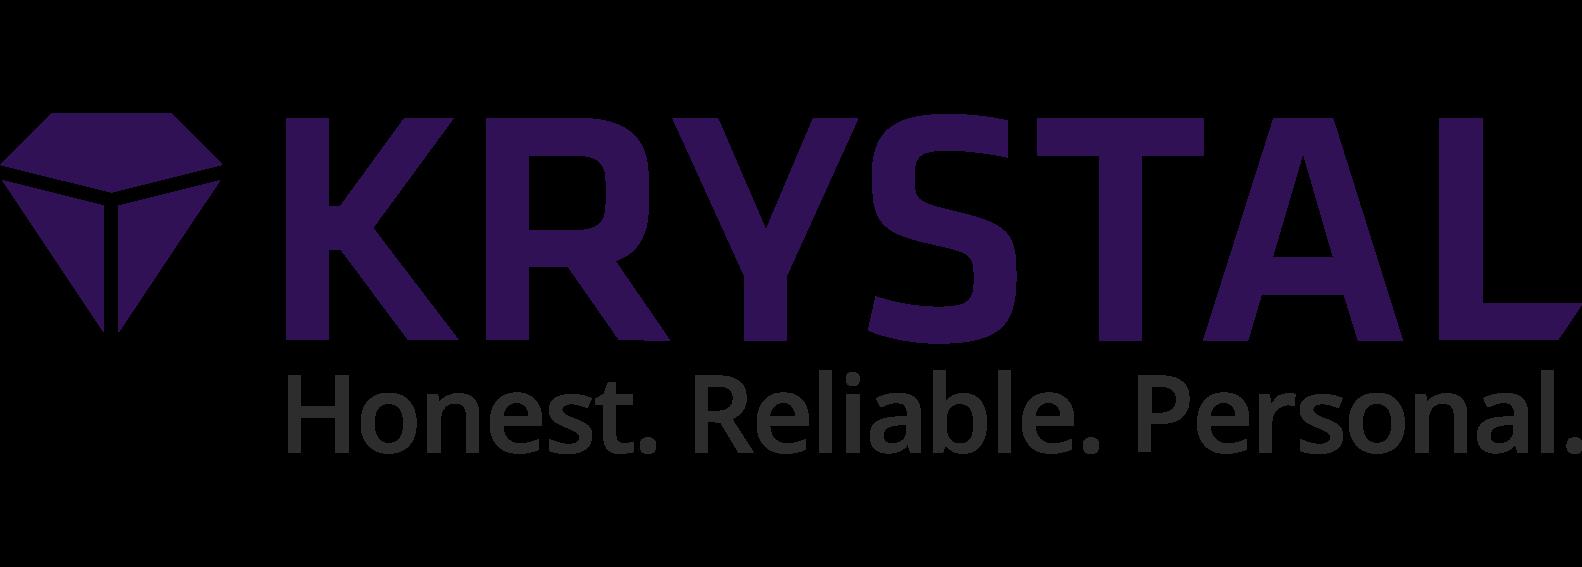 Krystal Hosting Logo